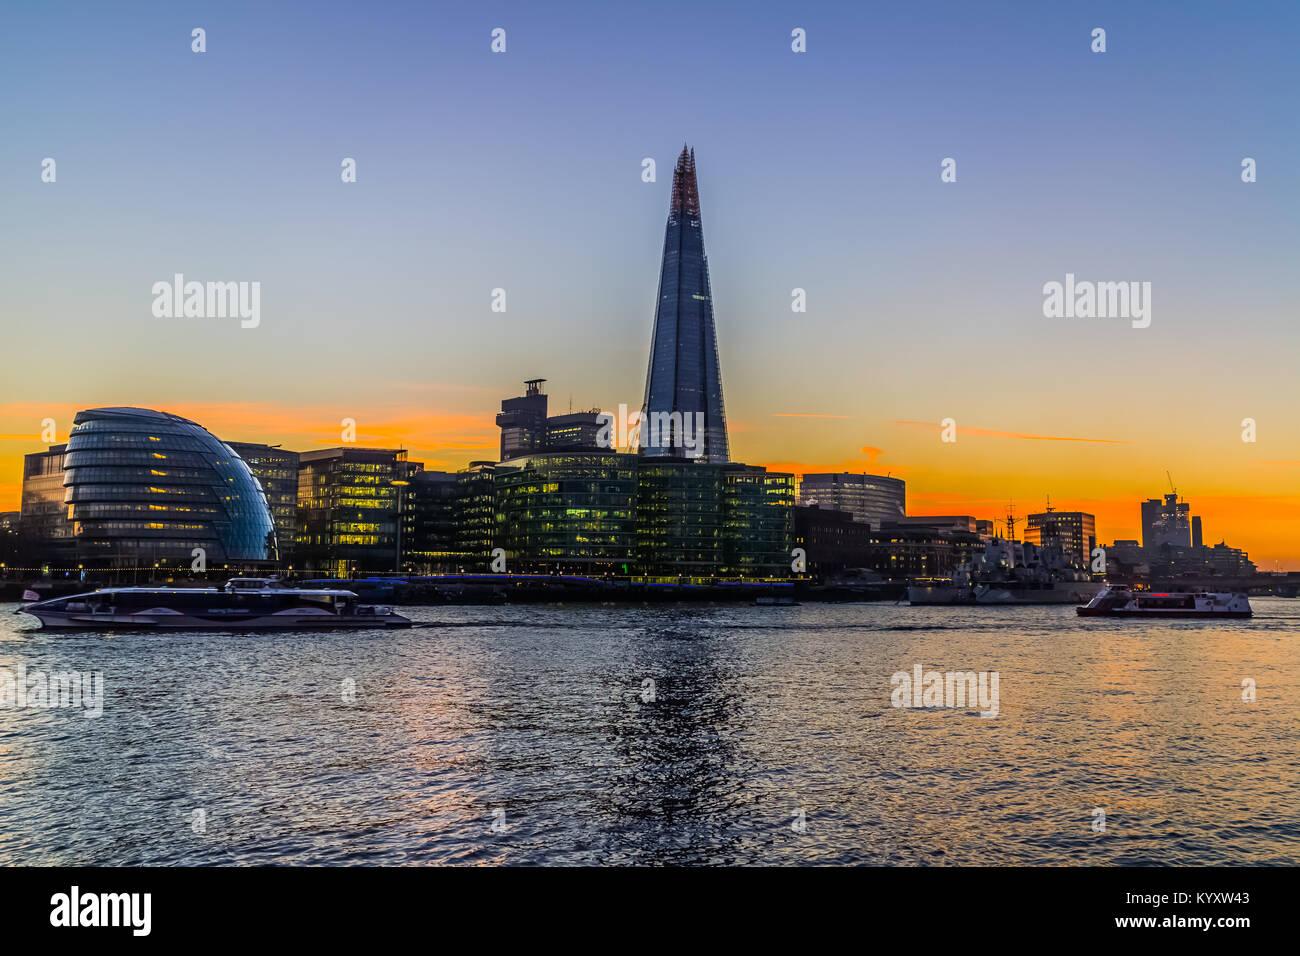 City Hall and The Shard, Embankment / River Thames, London Stock Photo